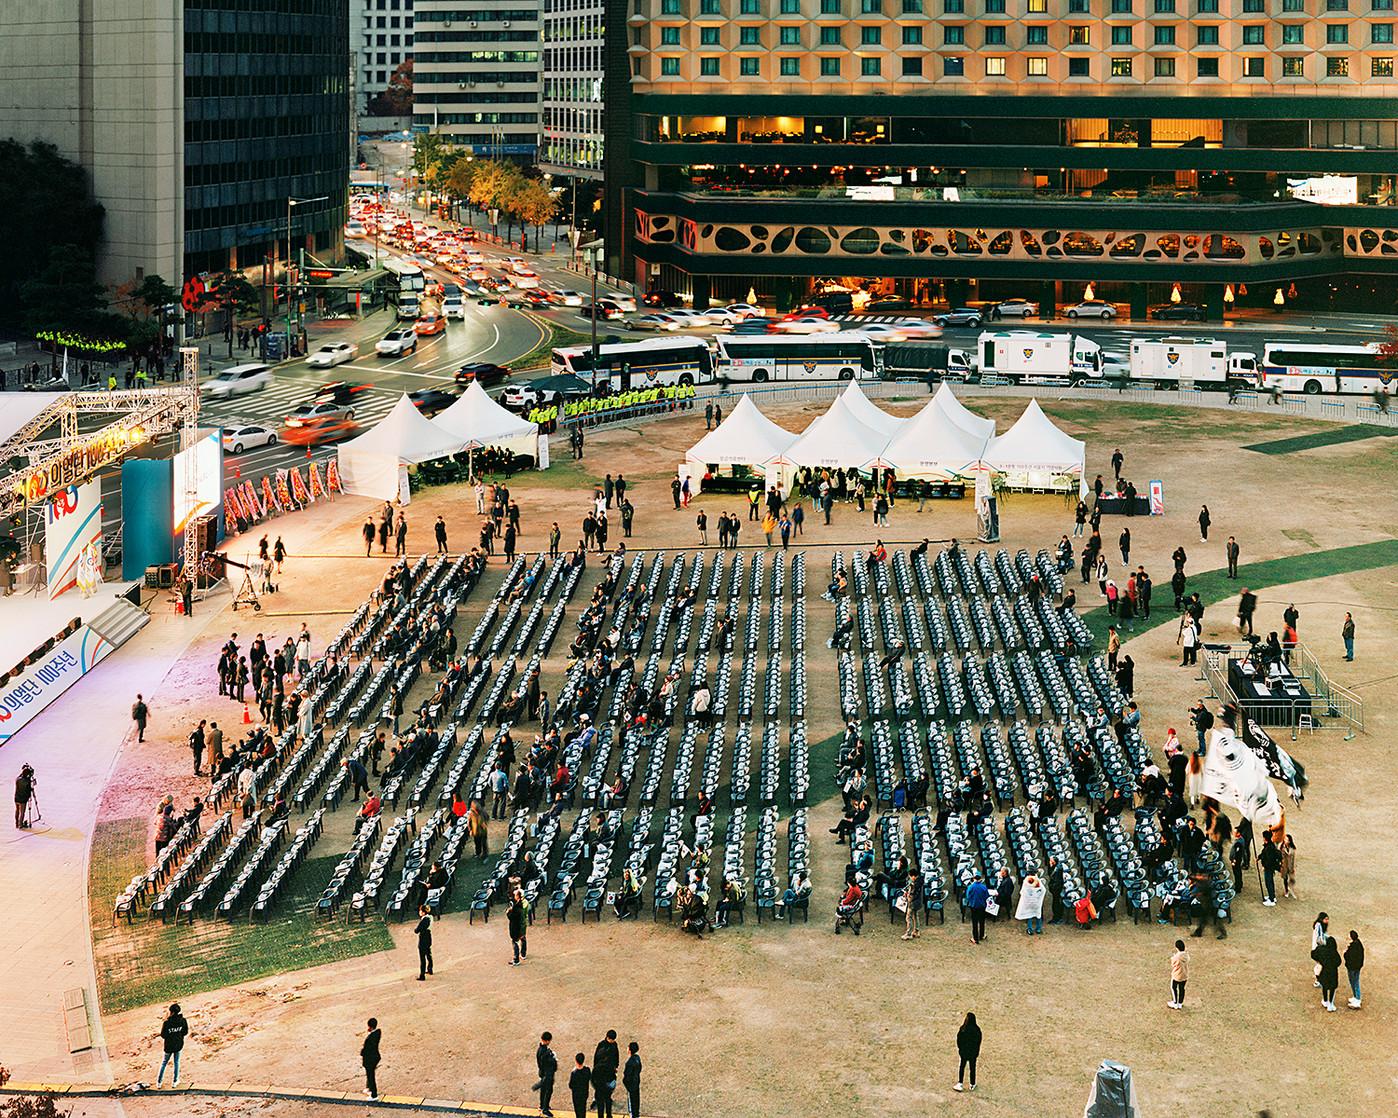 100th anniversary of the Eui-yeol-dan, Seoul, November 2019